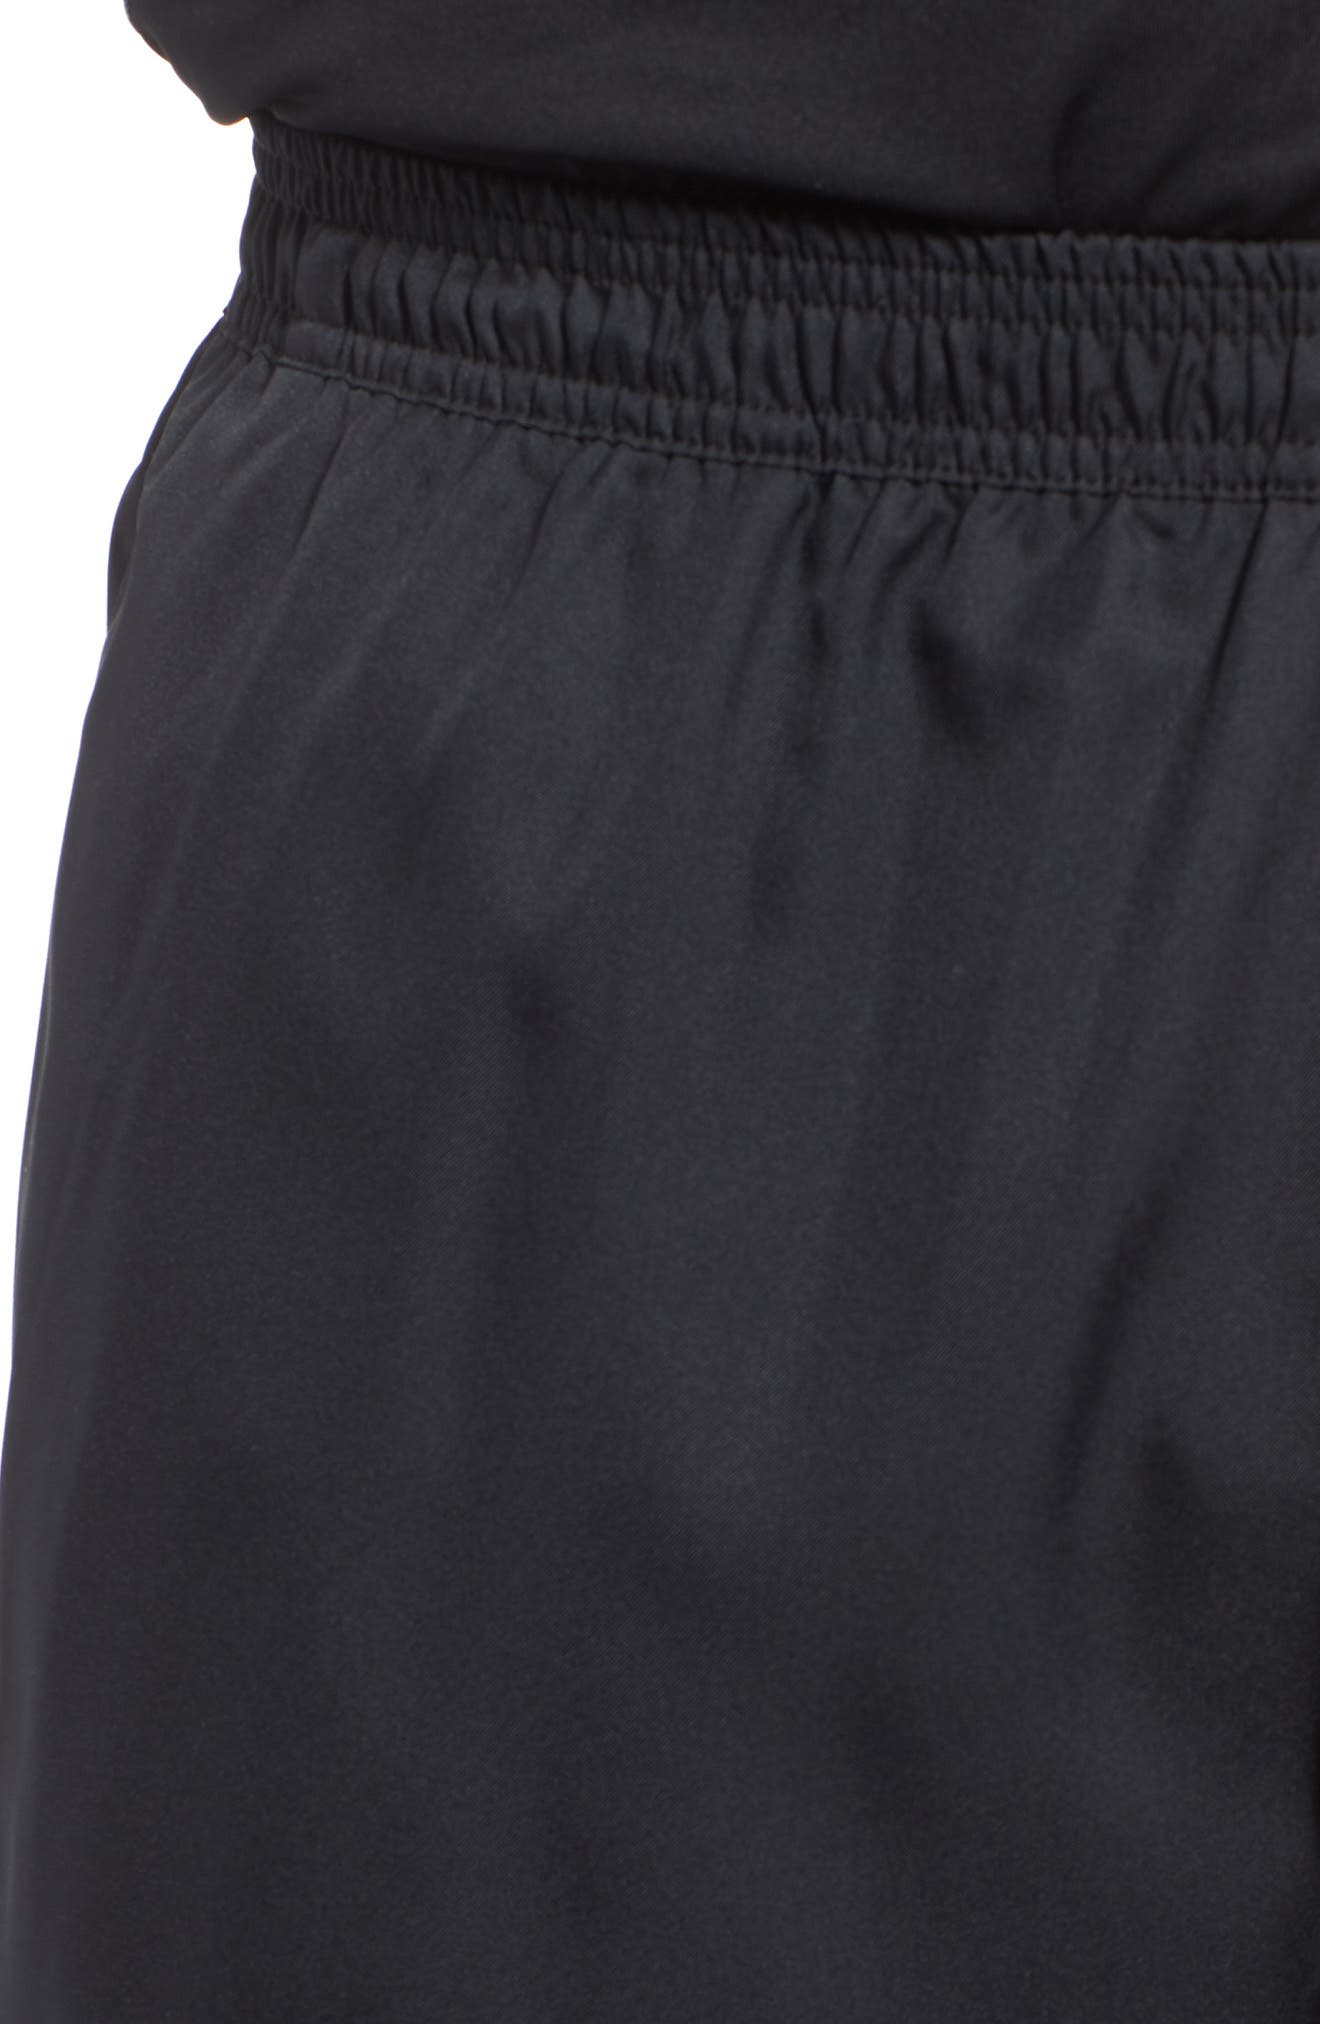 Tennis Shorts,                             Alternate thumbnail 4, color,                             010